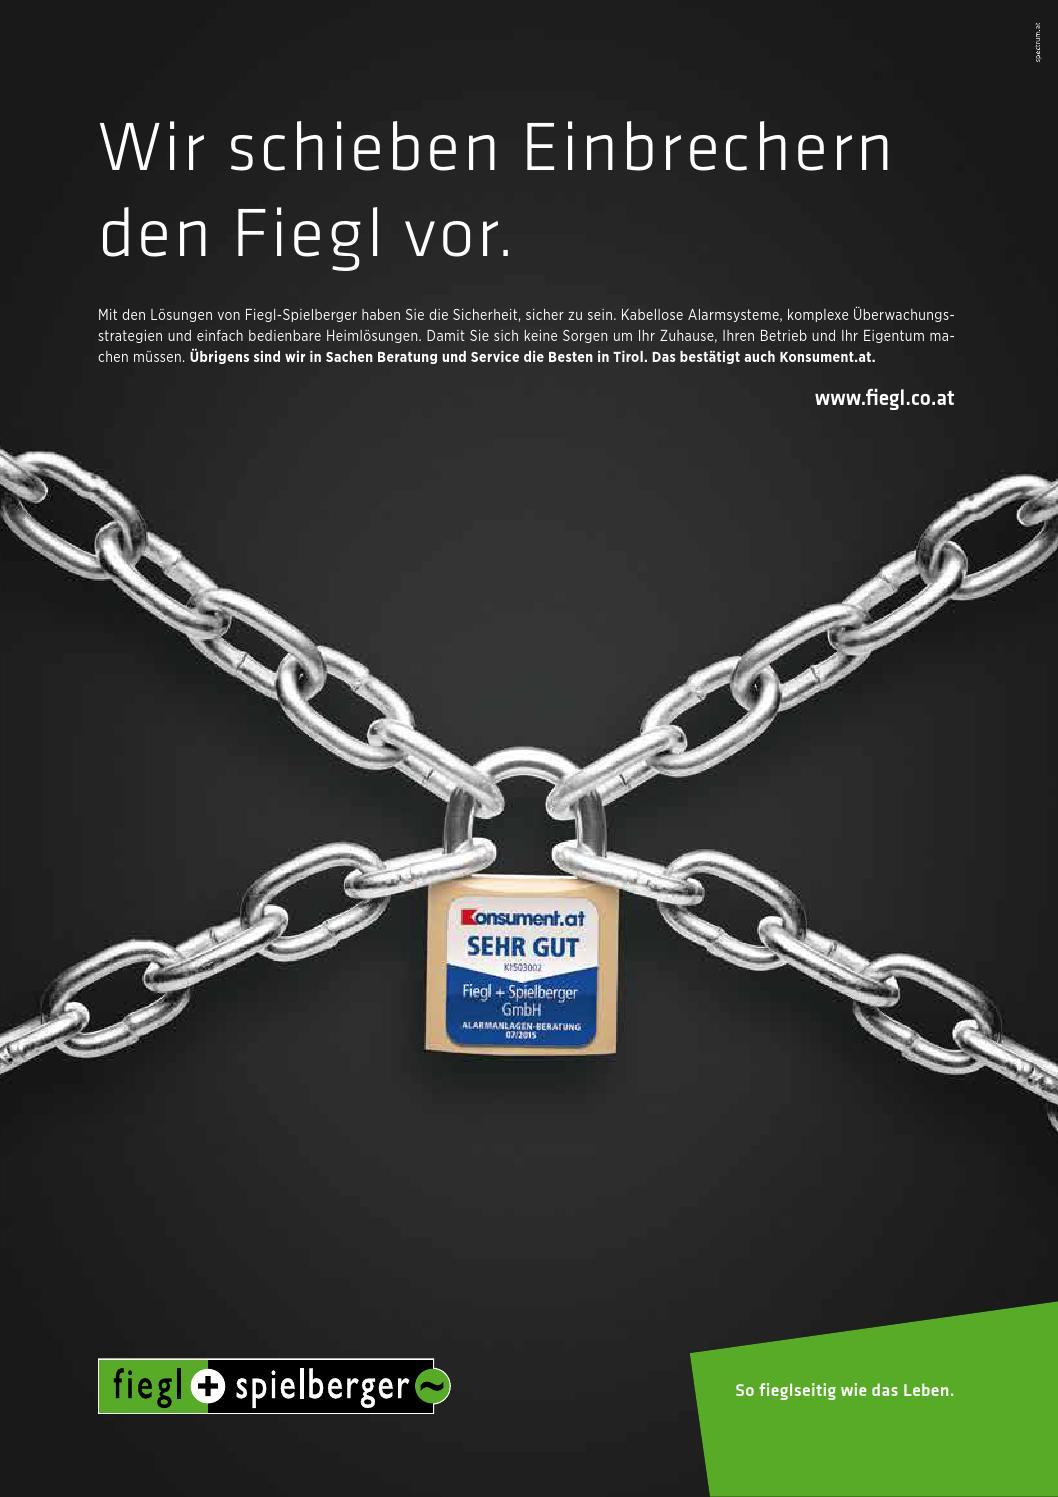 Fiegl spiegel 10/2015 by eco.nova verlags gmbh - issuu